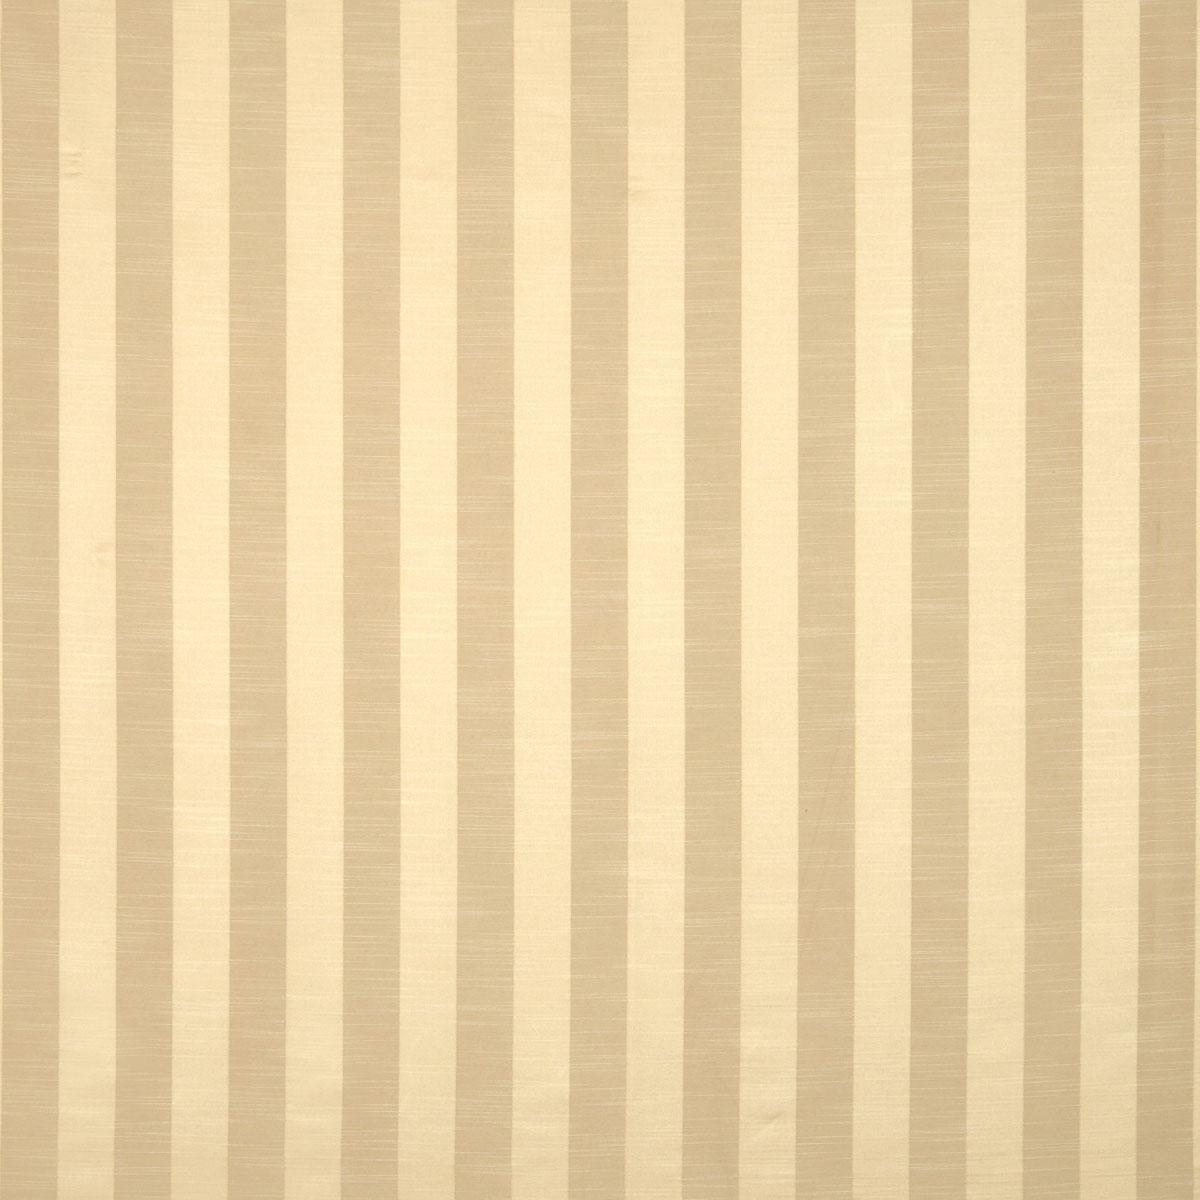 Curtains texture gold - Ascot Stripe Curtain Fabric